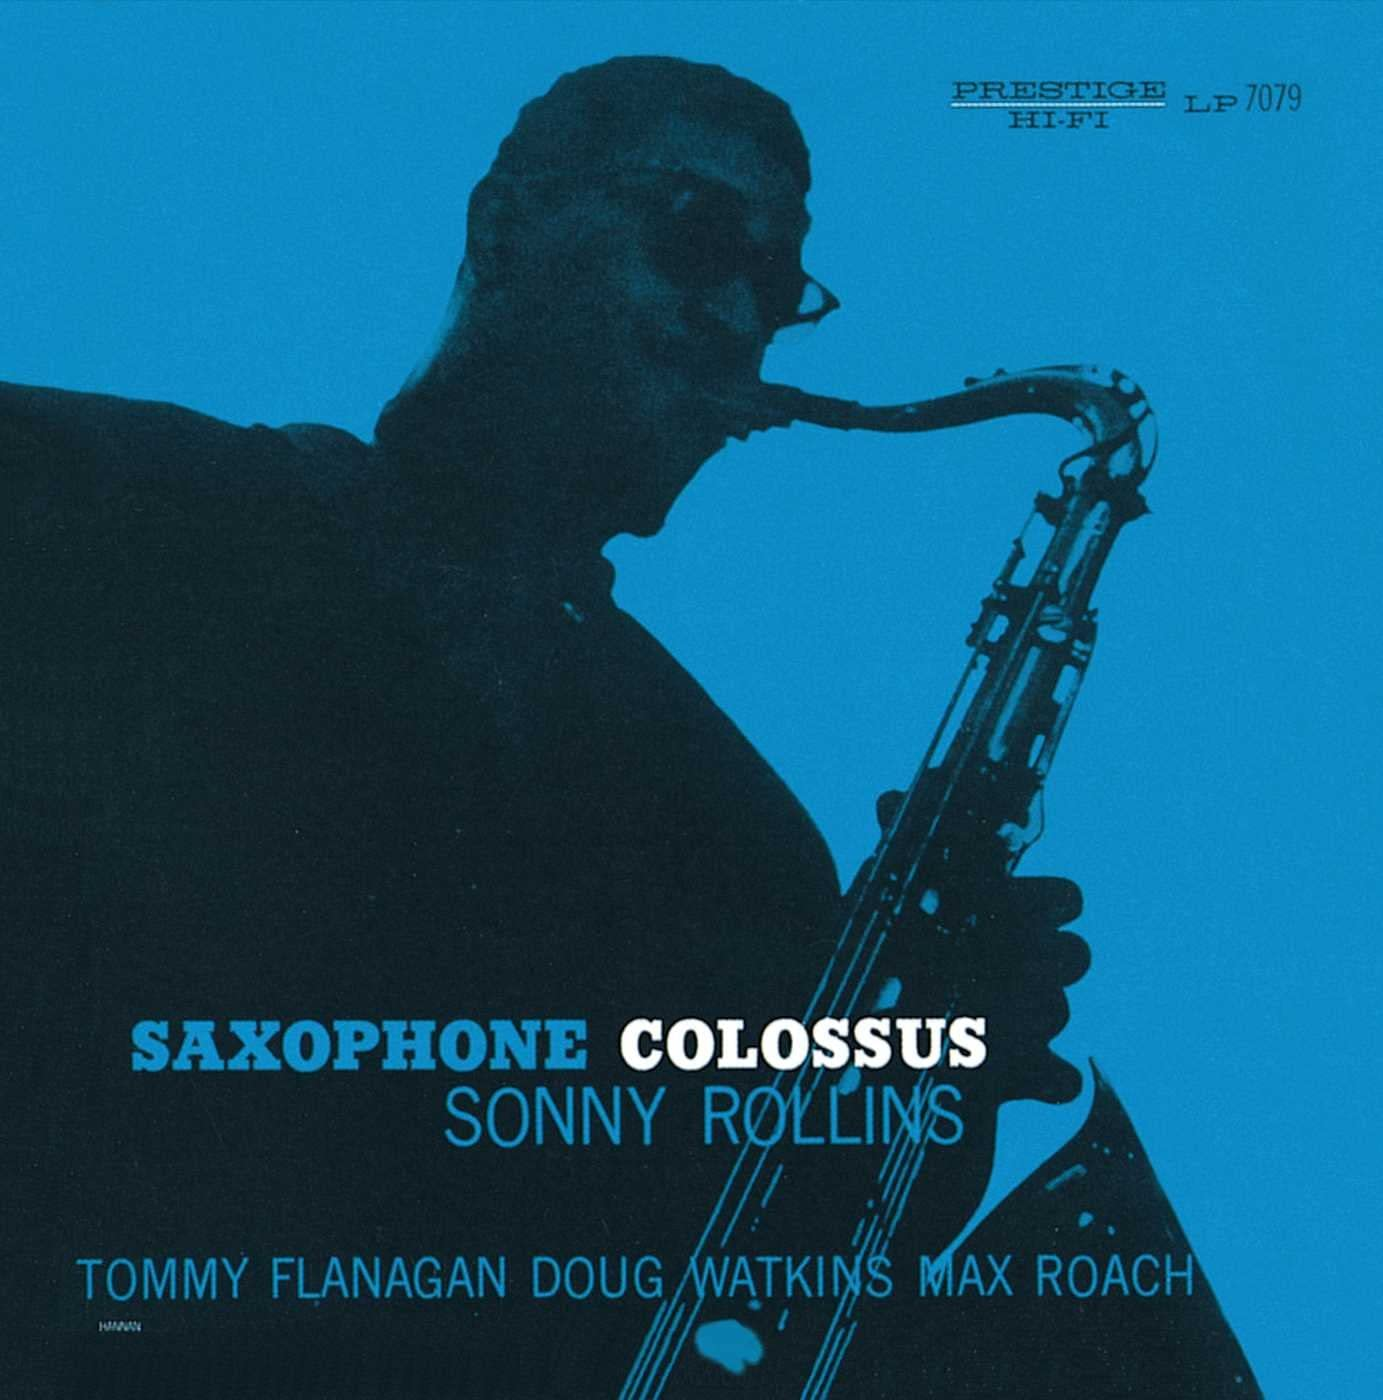 Amazon | SAXOPHONE COLOSSUS | Sonny Rollins, Max Roach, Doug Watkins, Tommy Flanagan | モダンジャズ | 音楽